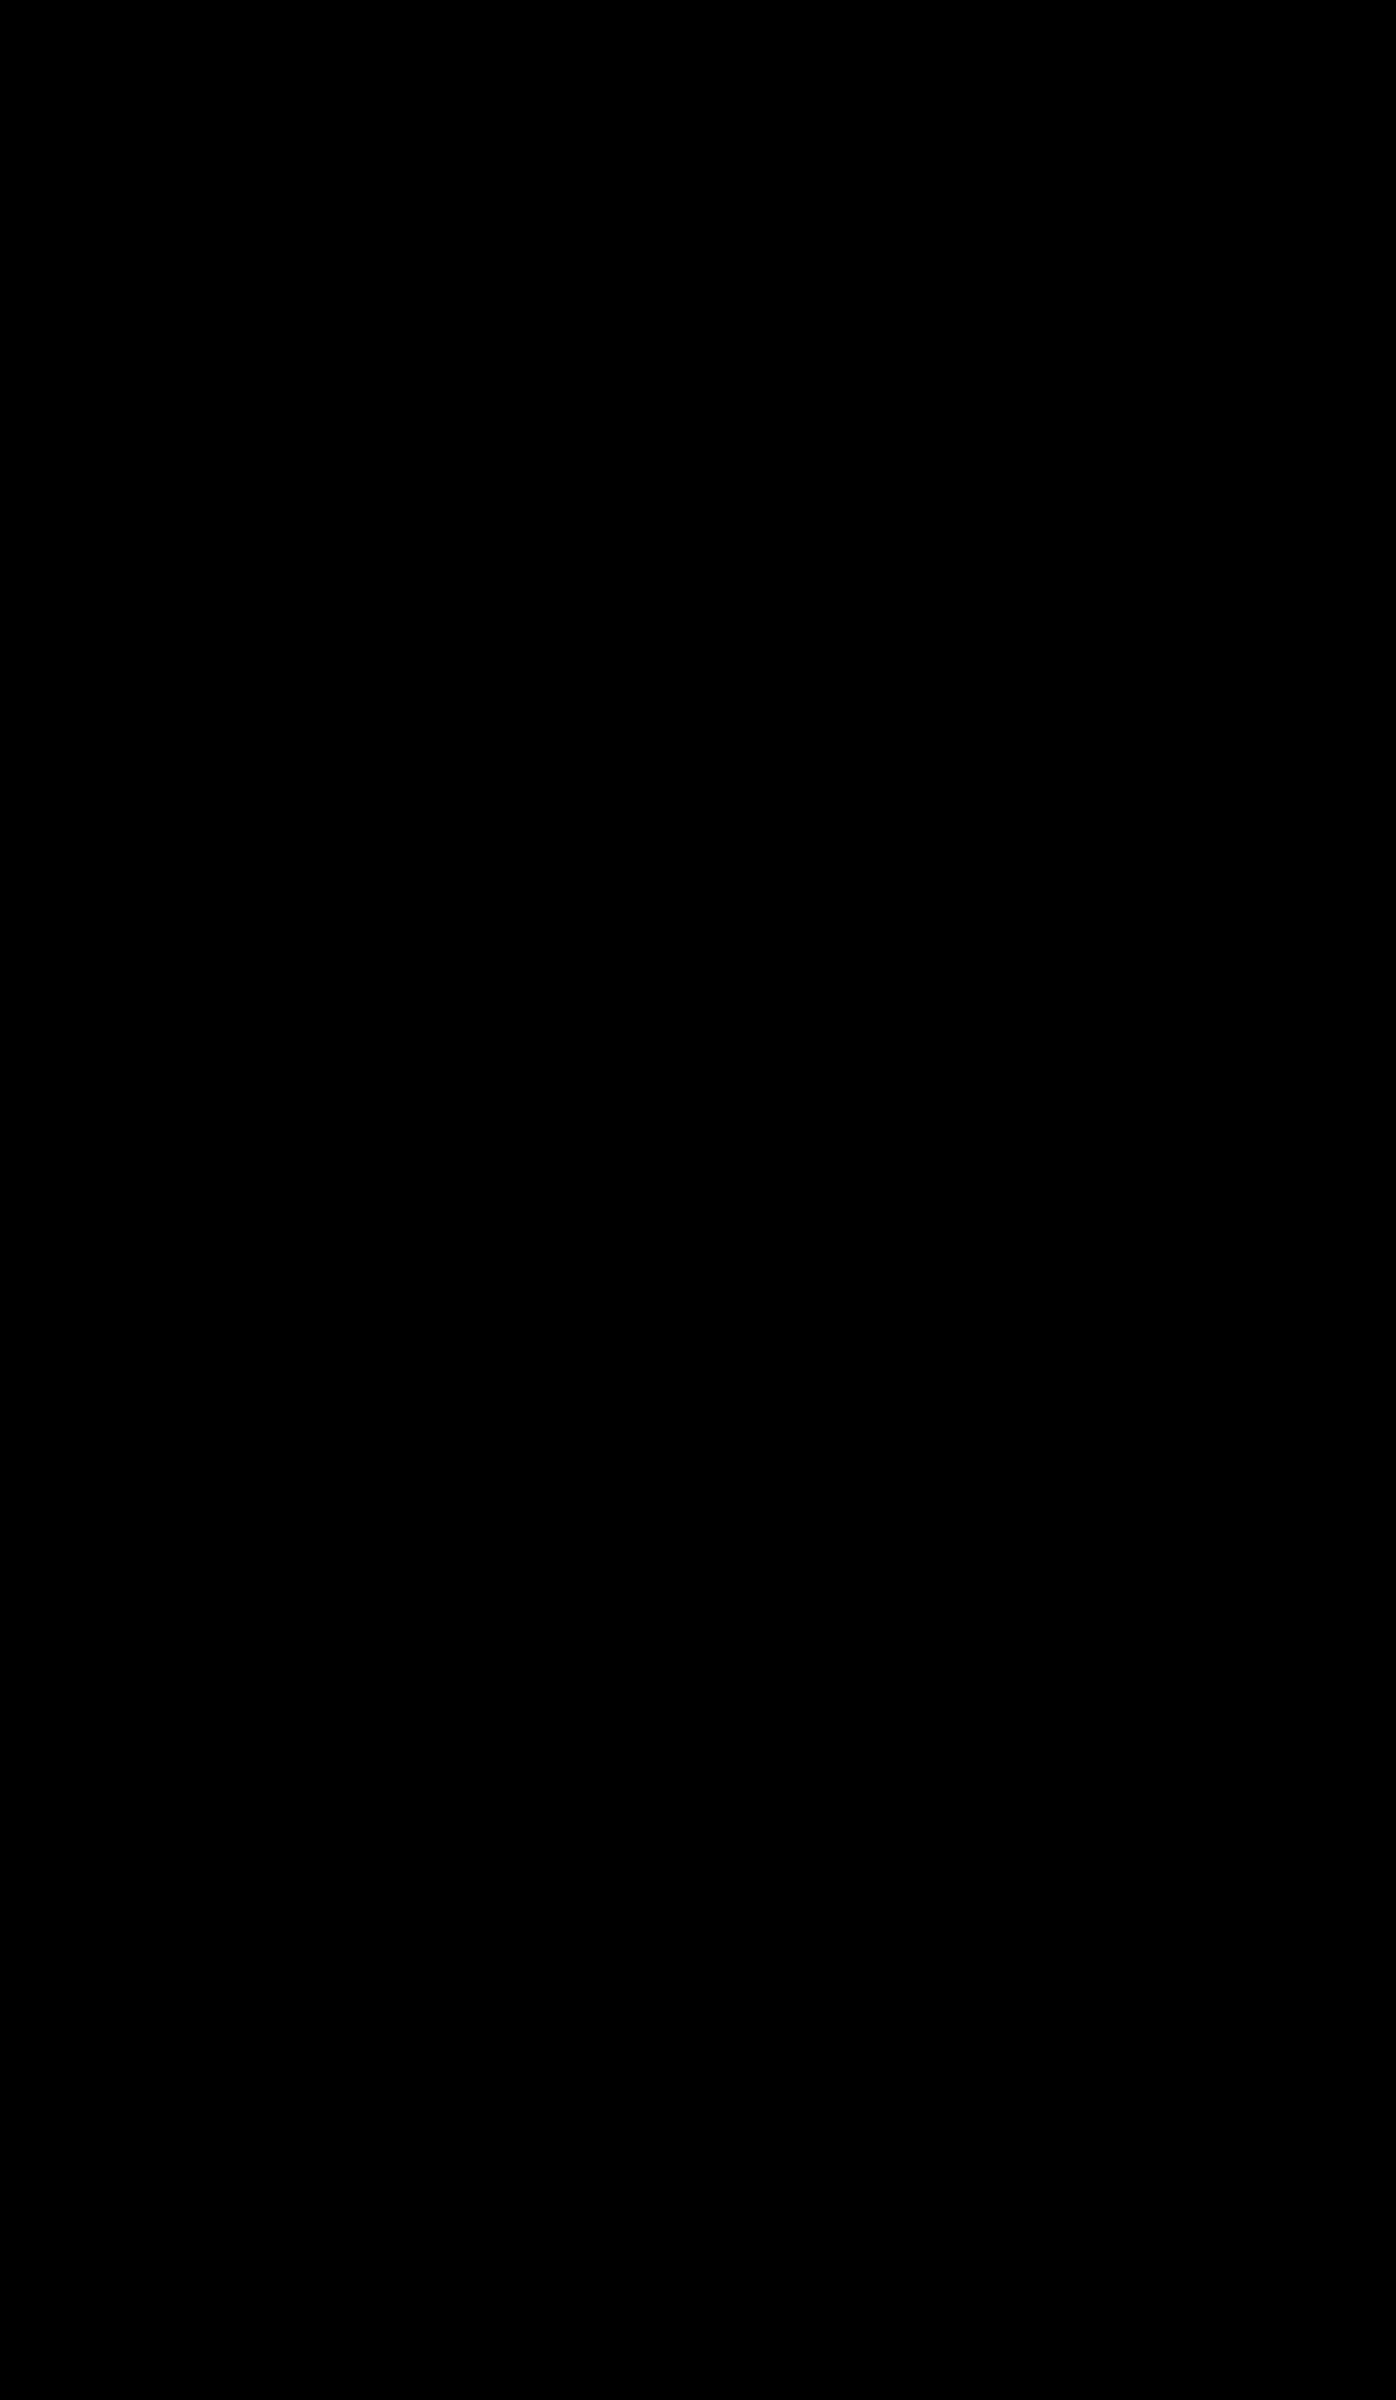 Hands clipart logo, Hands logo Transparent FREE for download.